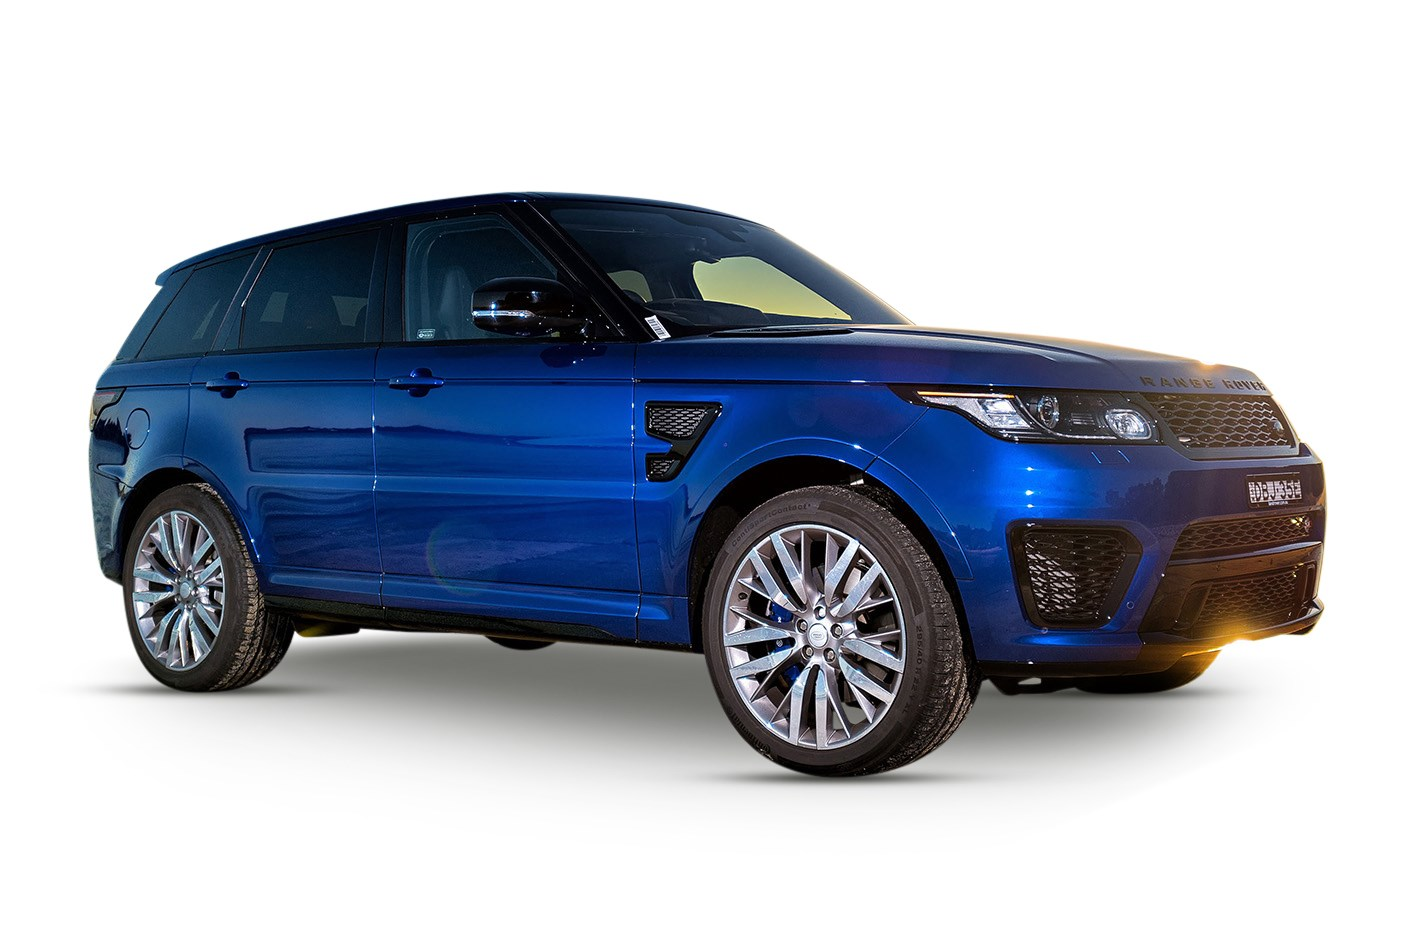 2018 Land Rover Range Sport V8 Sc Svr 50l 8cyl Petrol Supercharged 2016 Automatic Suv